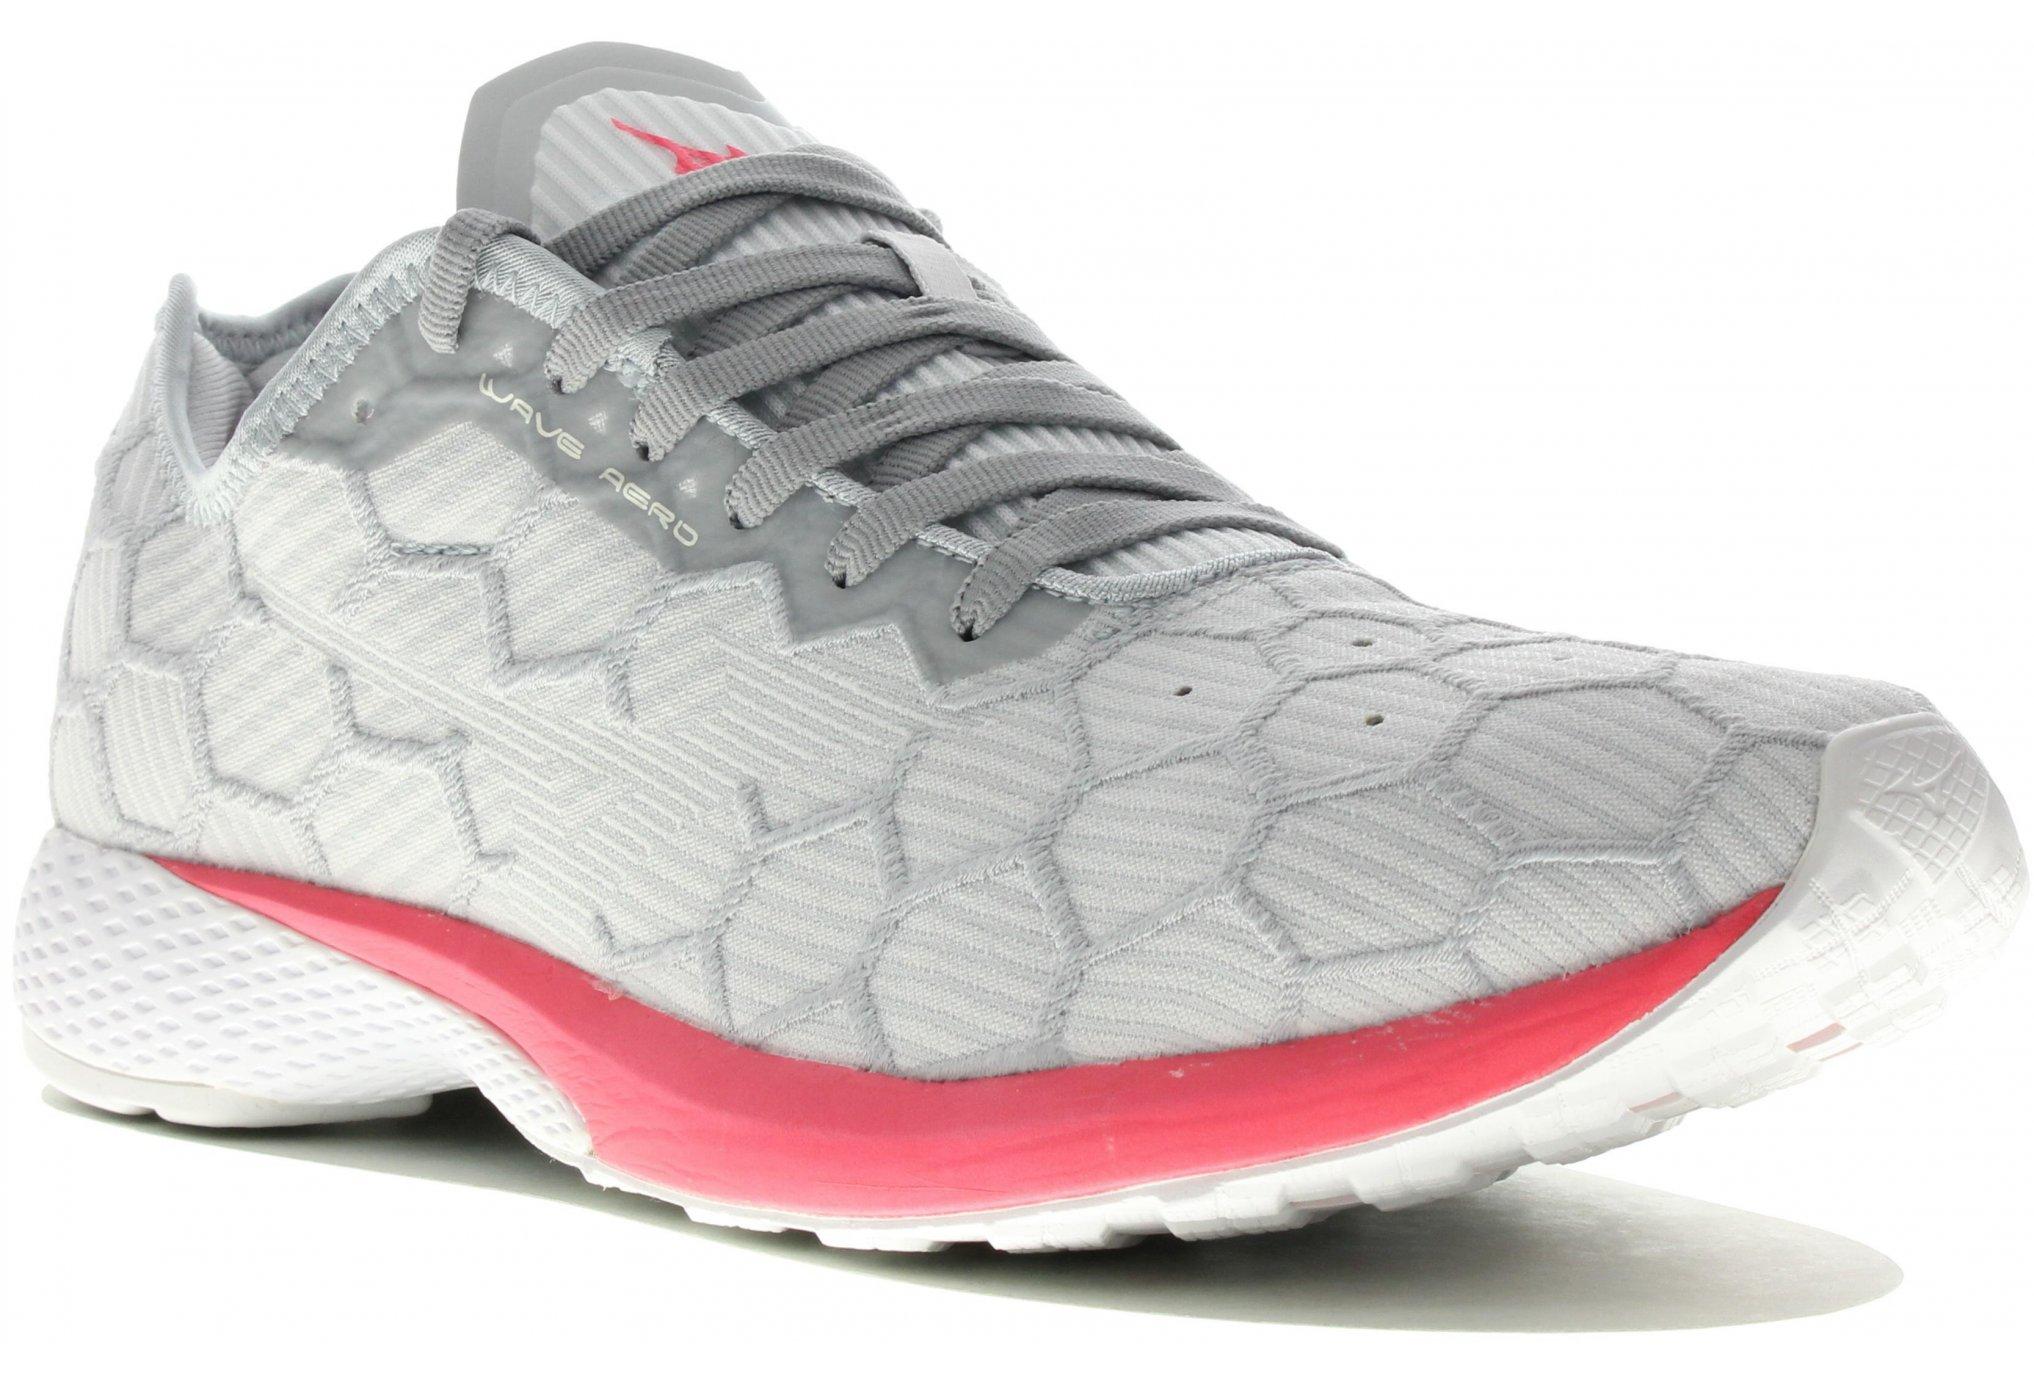 Mizuno Wave Aero 18 W Chaussures running femme